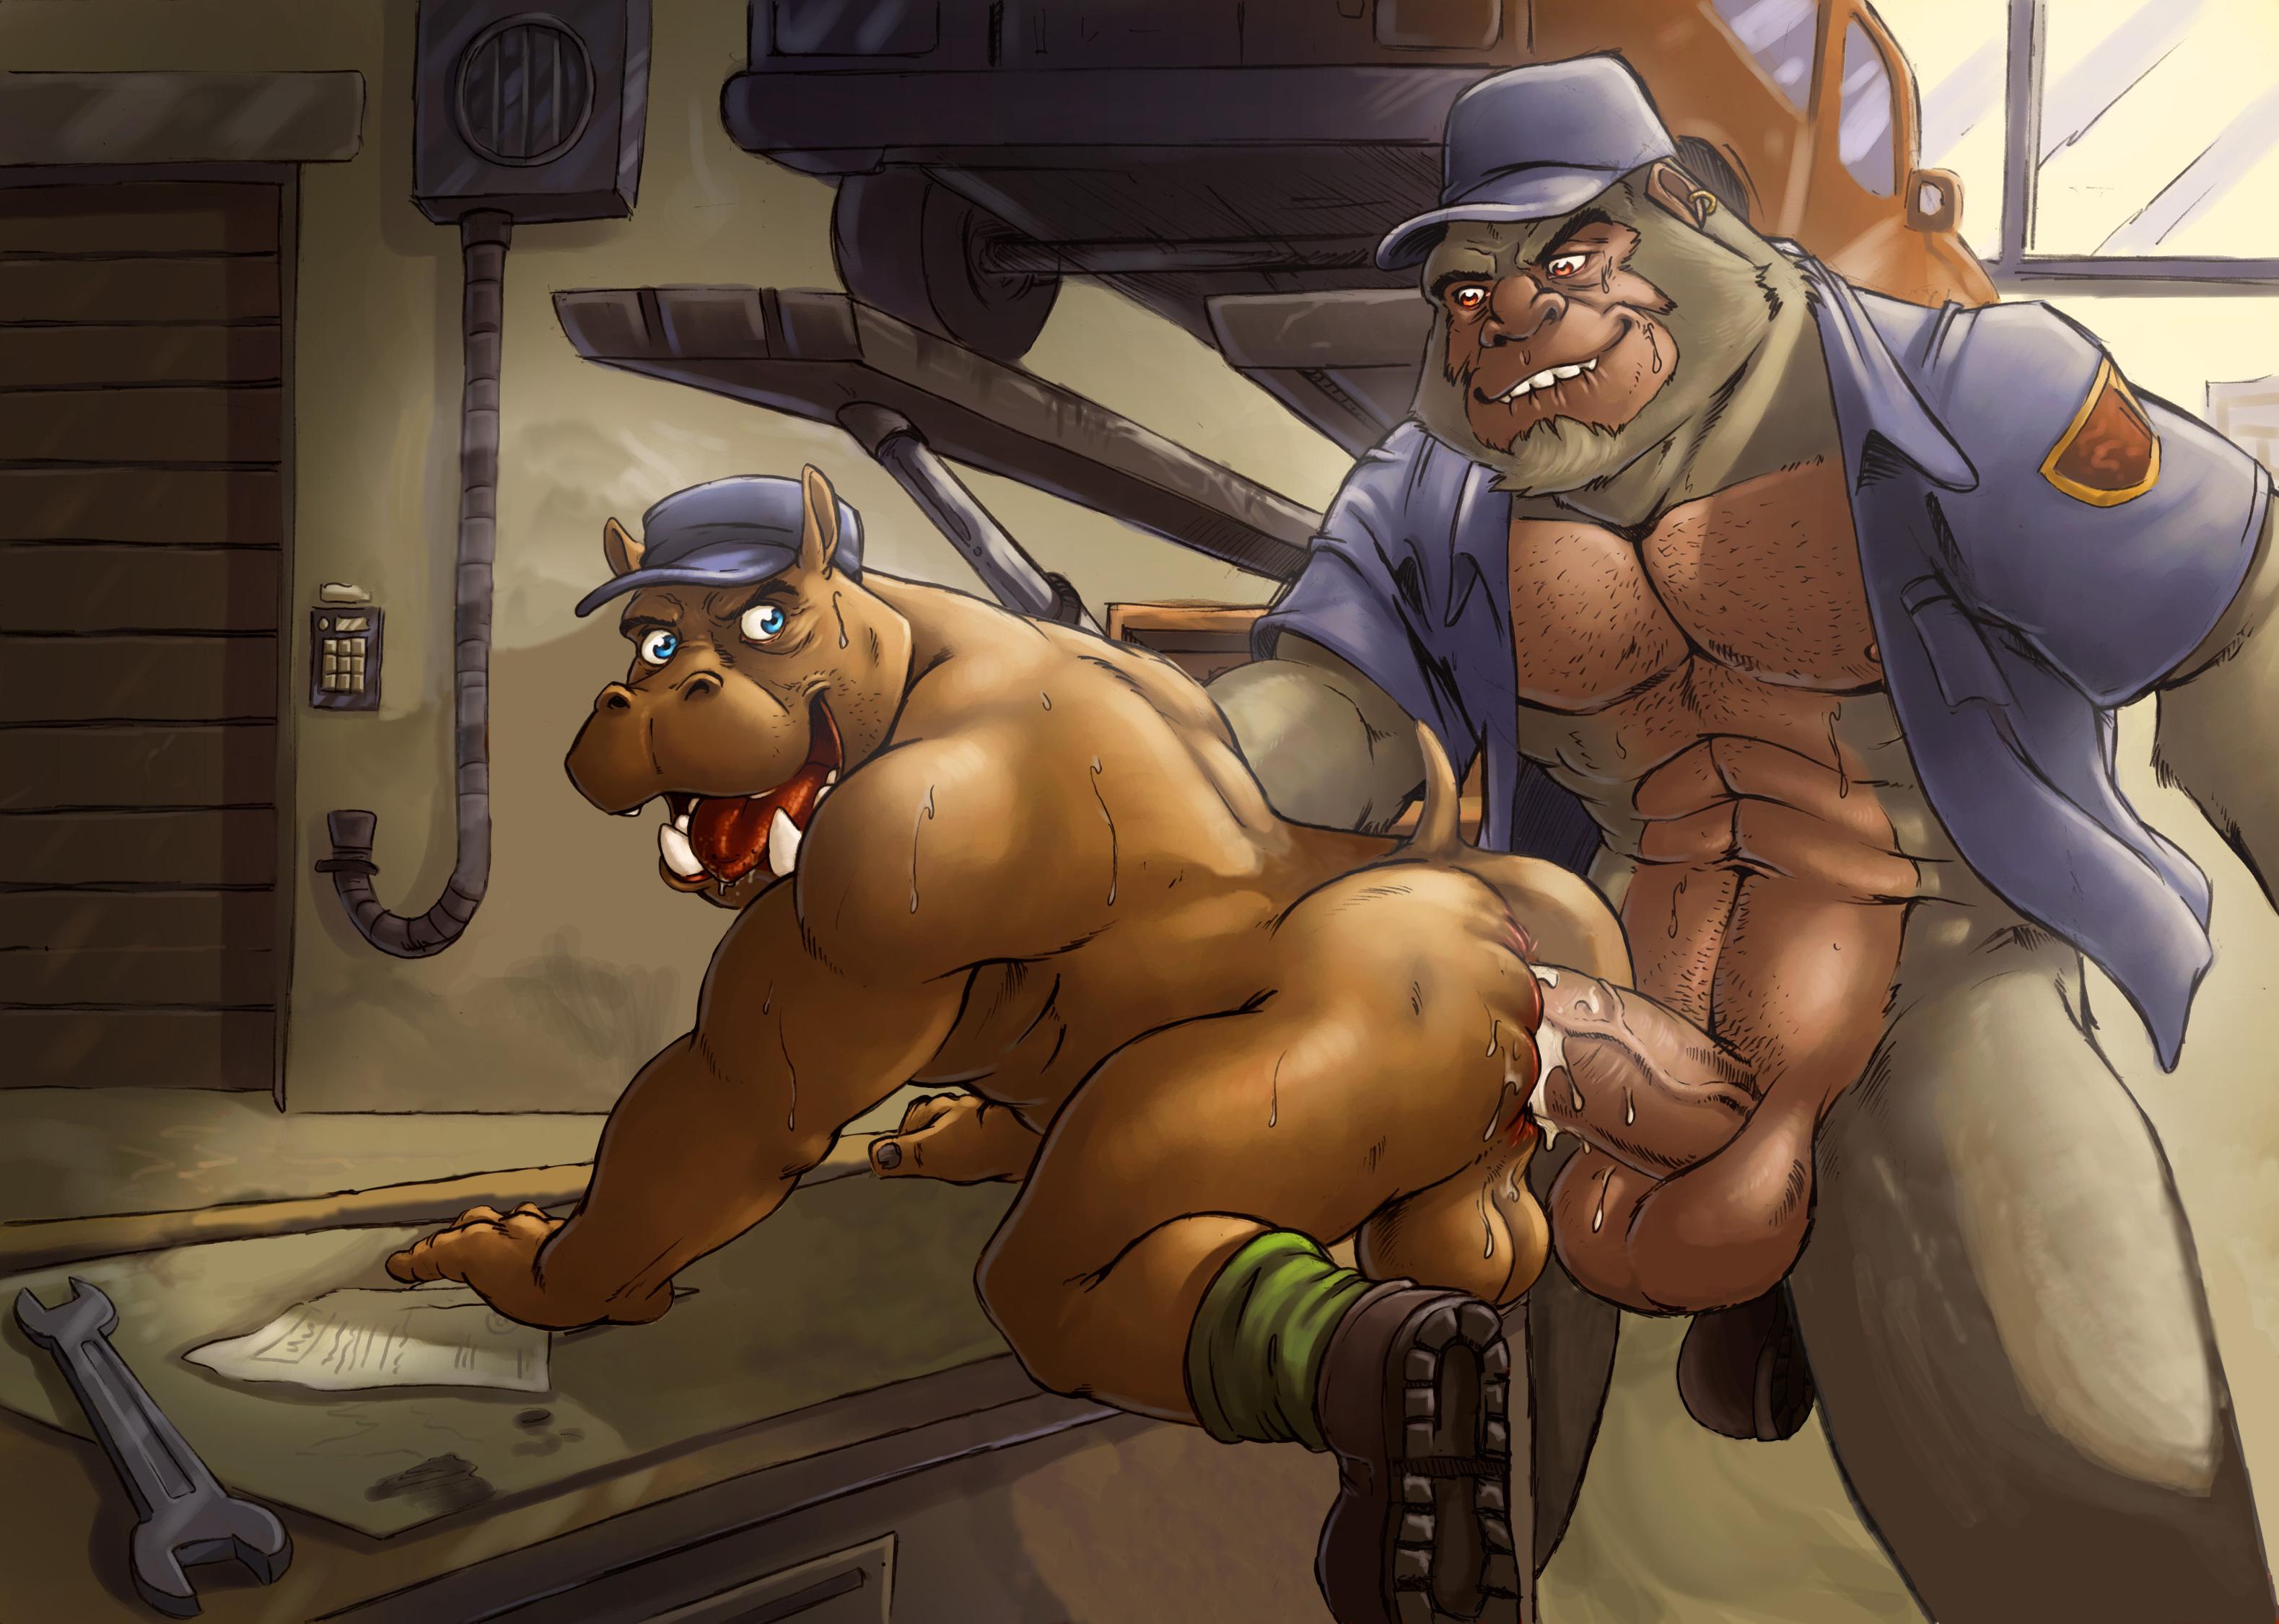 Gorilla man penetration